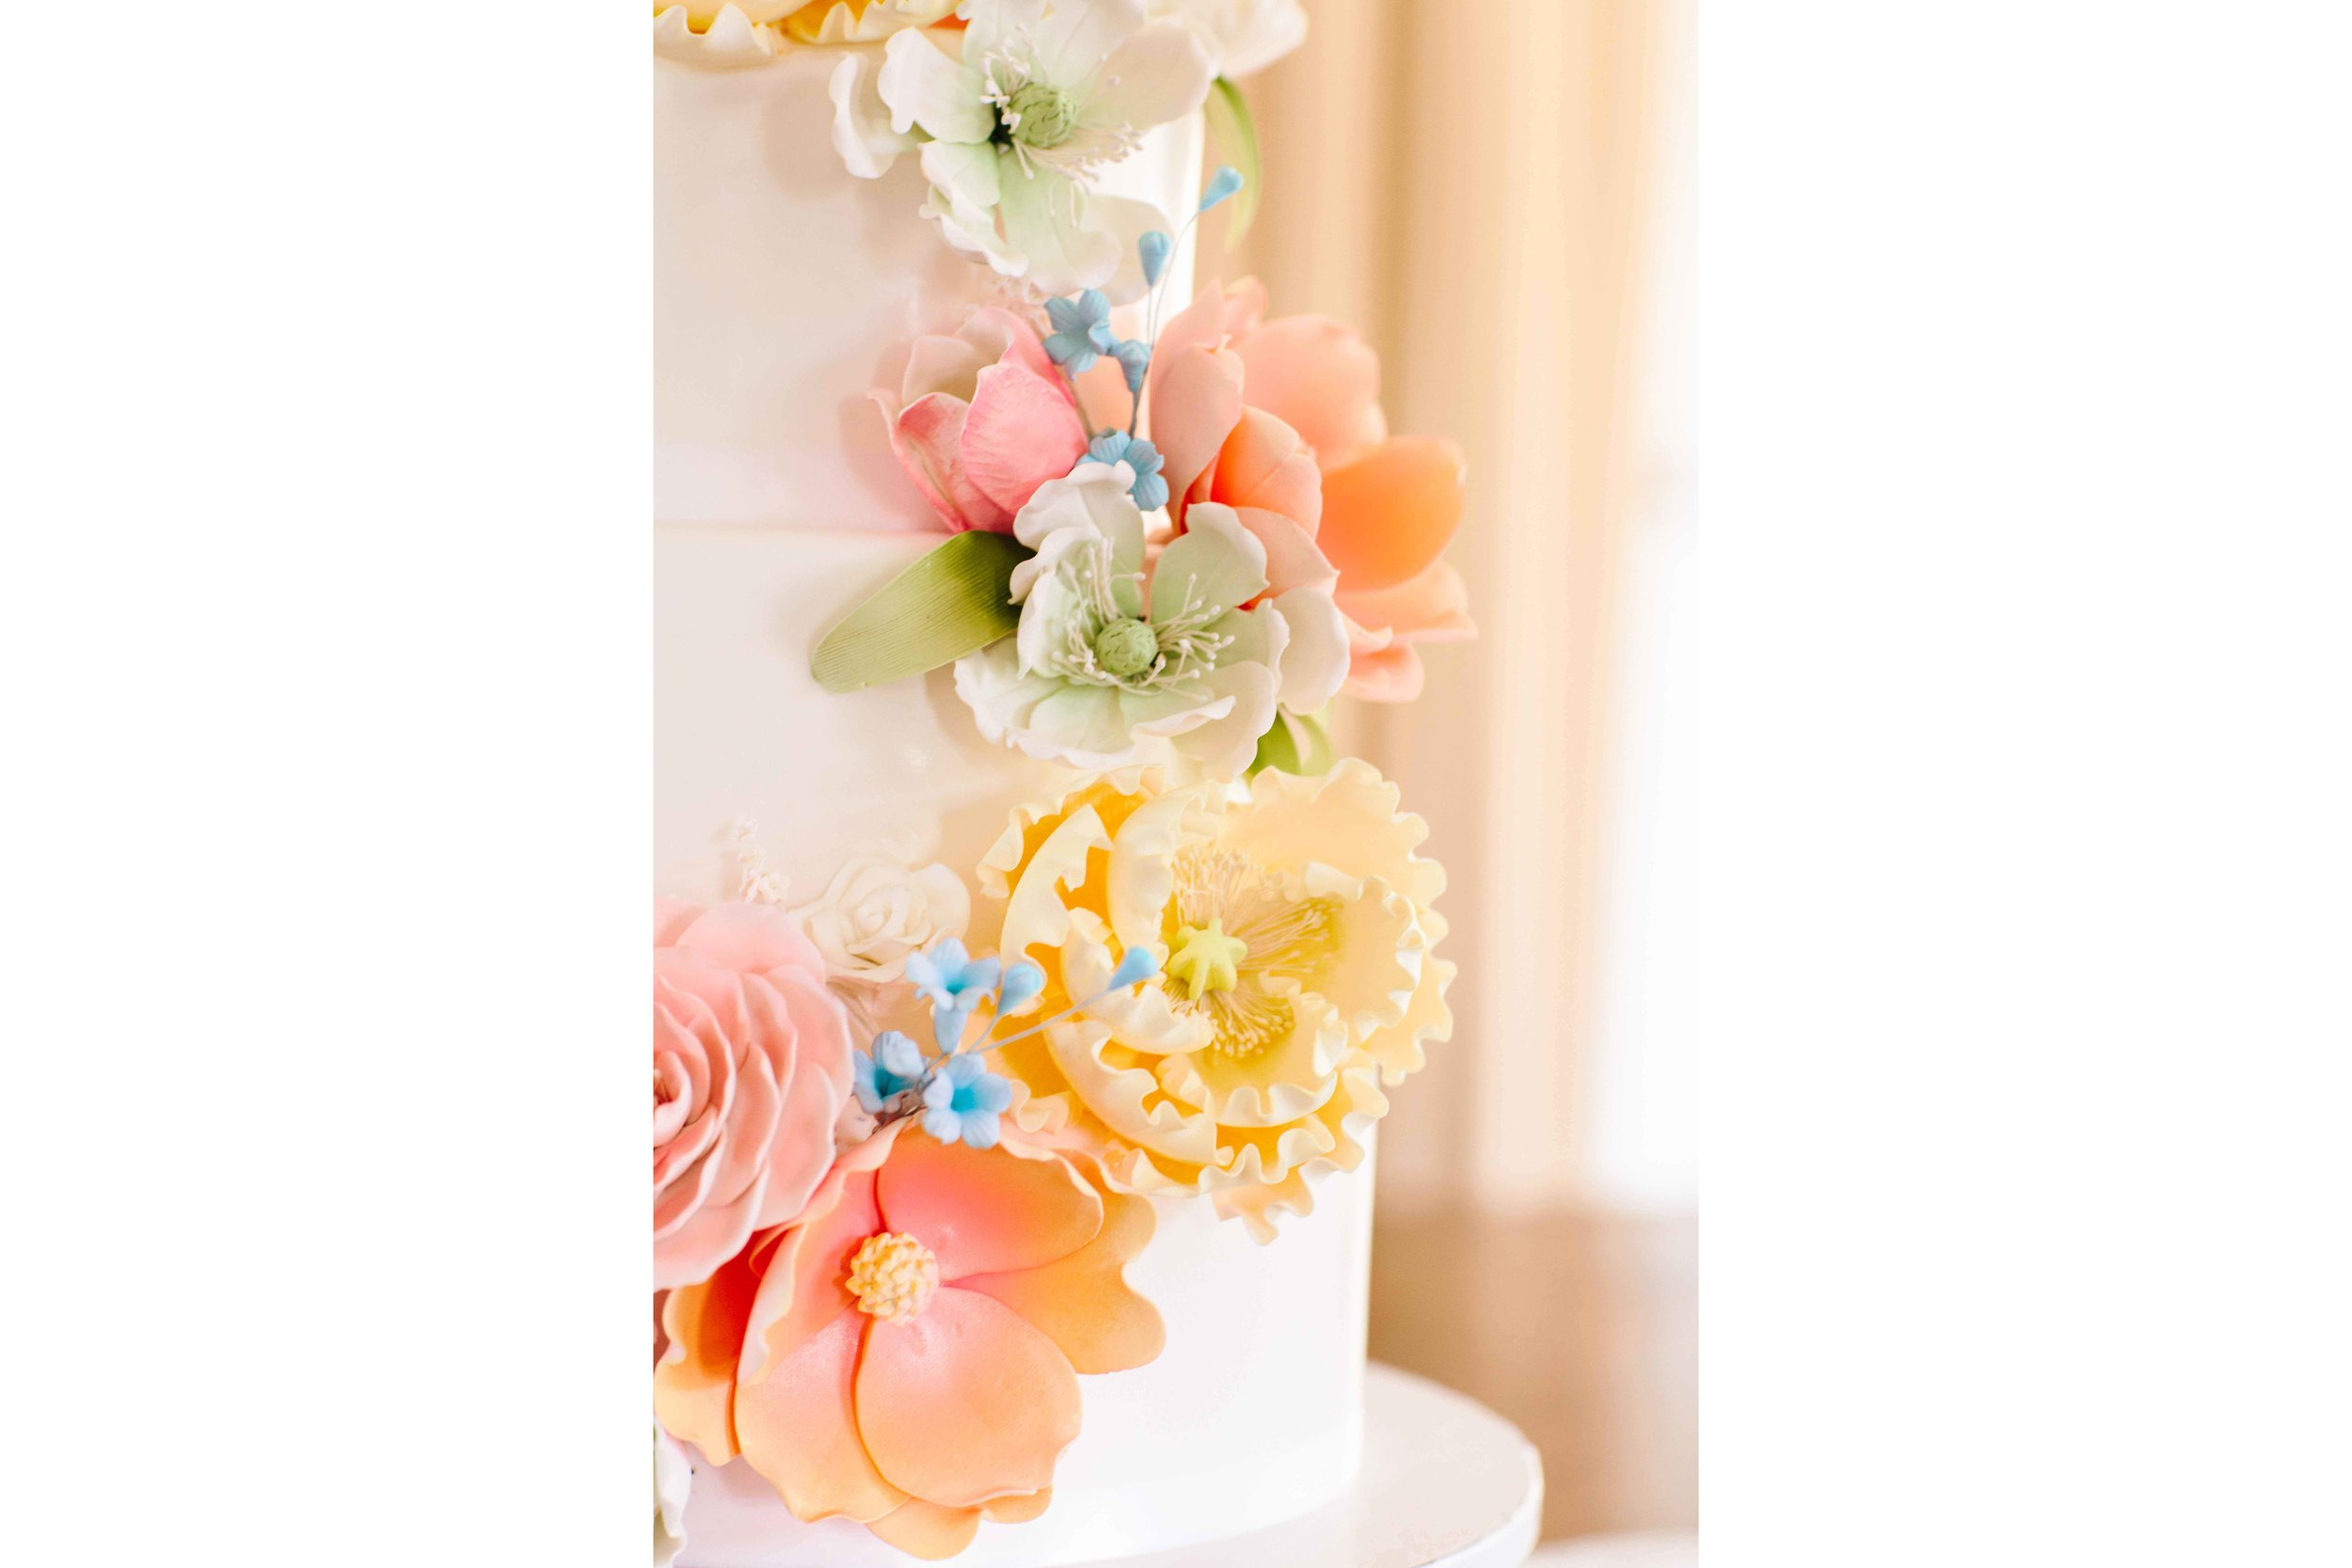 Oahu Wedding Photography - Wedding Cake Detail